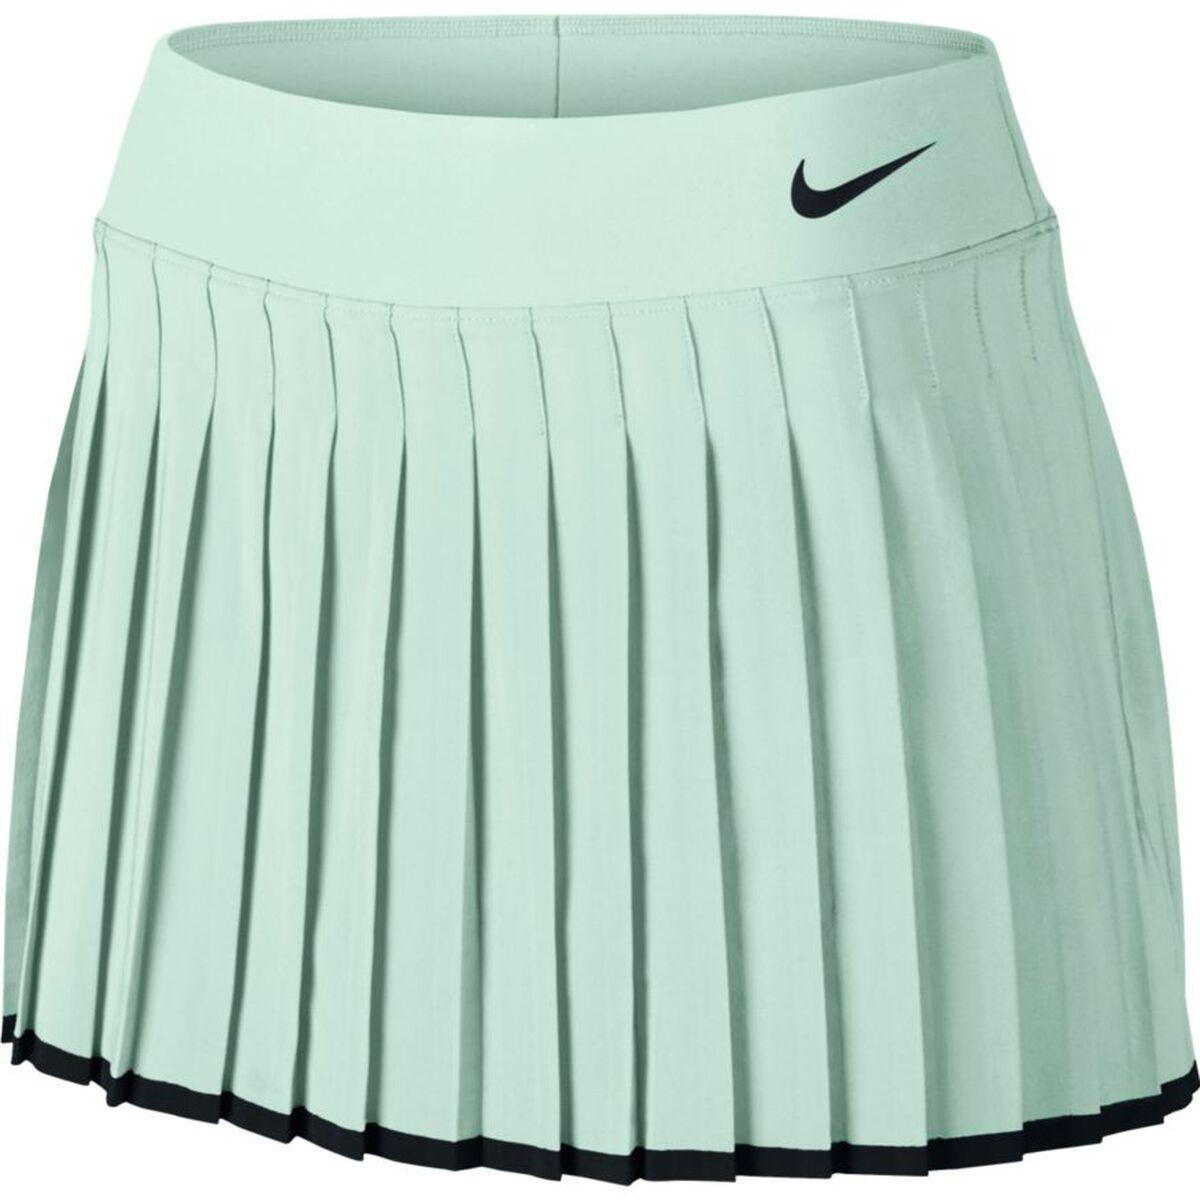 a4ff1f763 Nike Women's NikeCourt Victory Tennis Skirt | PGA TOUR Superstore